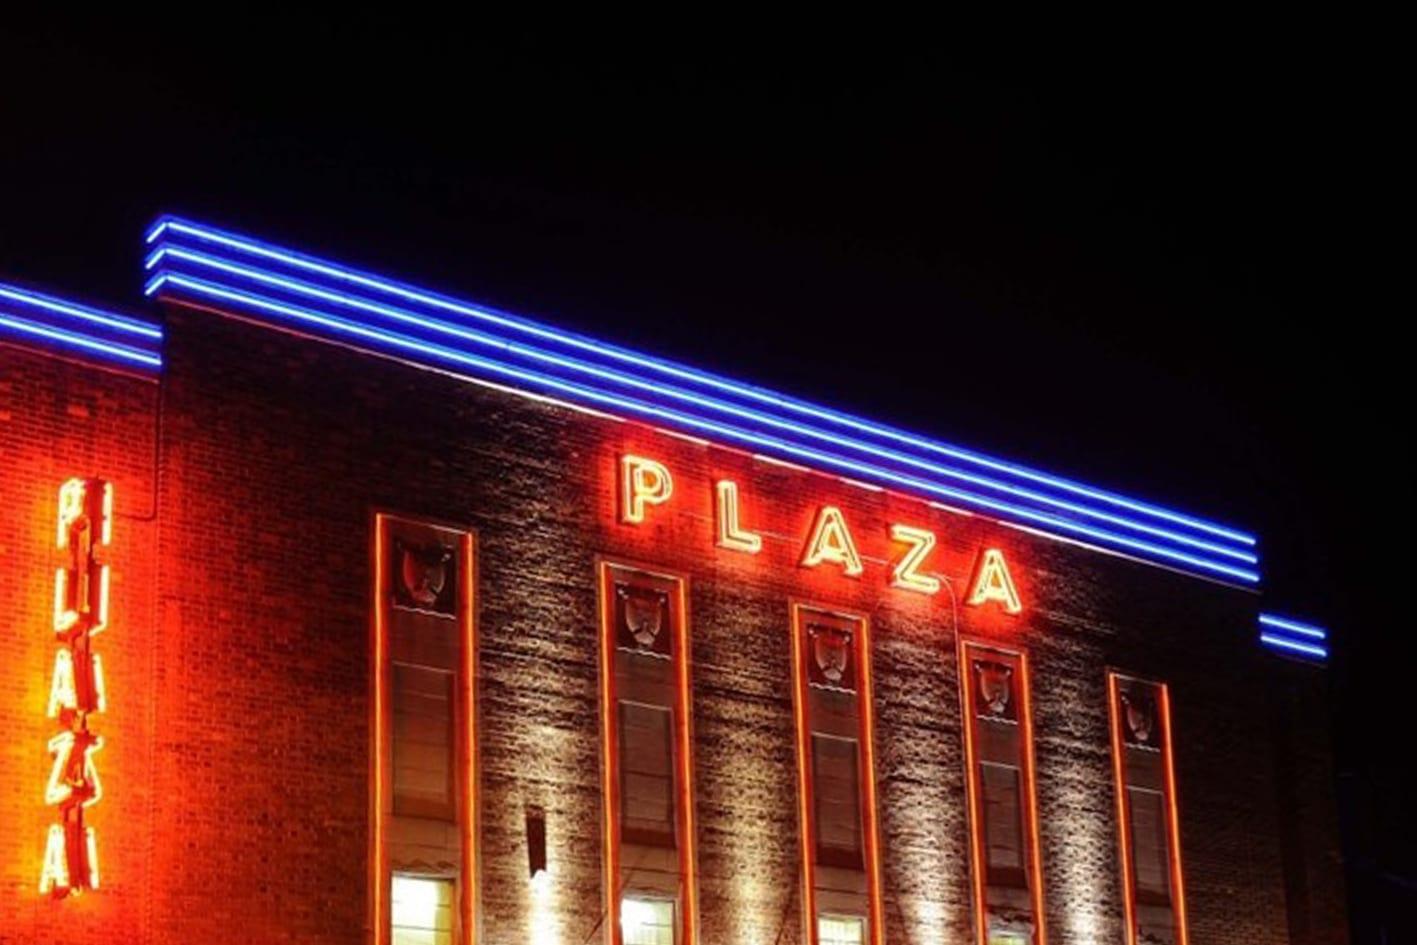 Plaza Community Cinema Liverpool